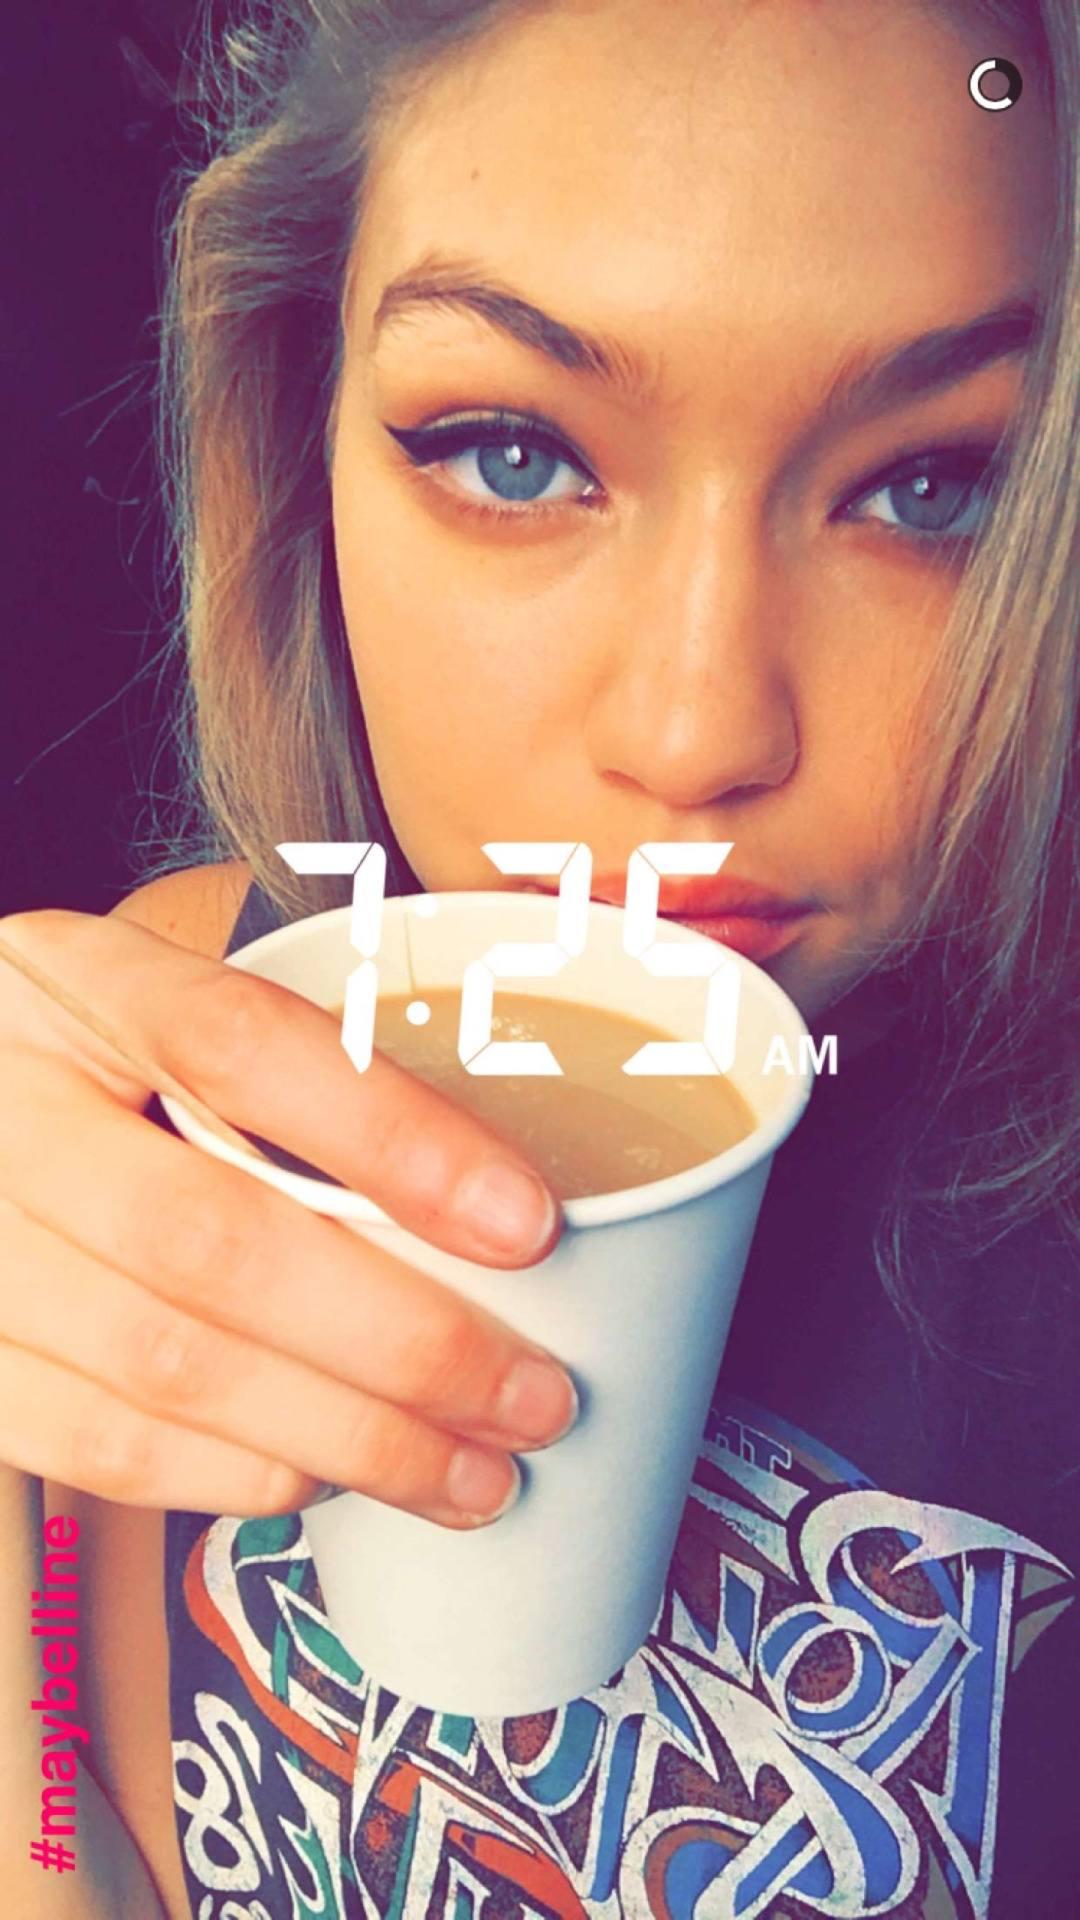 gigi2 Hollywood Celebrity Snapchats-15 Hollywood Snapchat Accounts to Follow